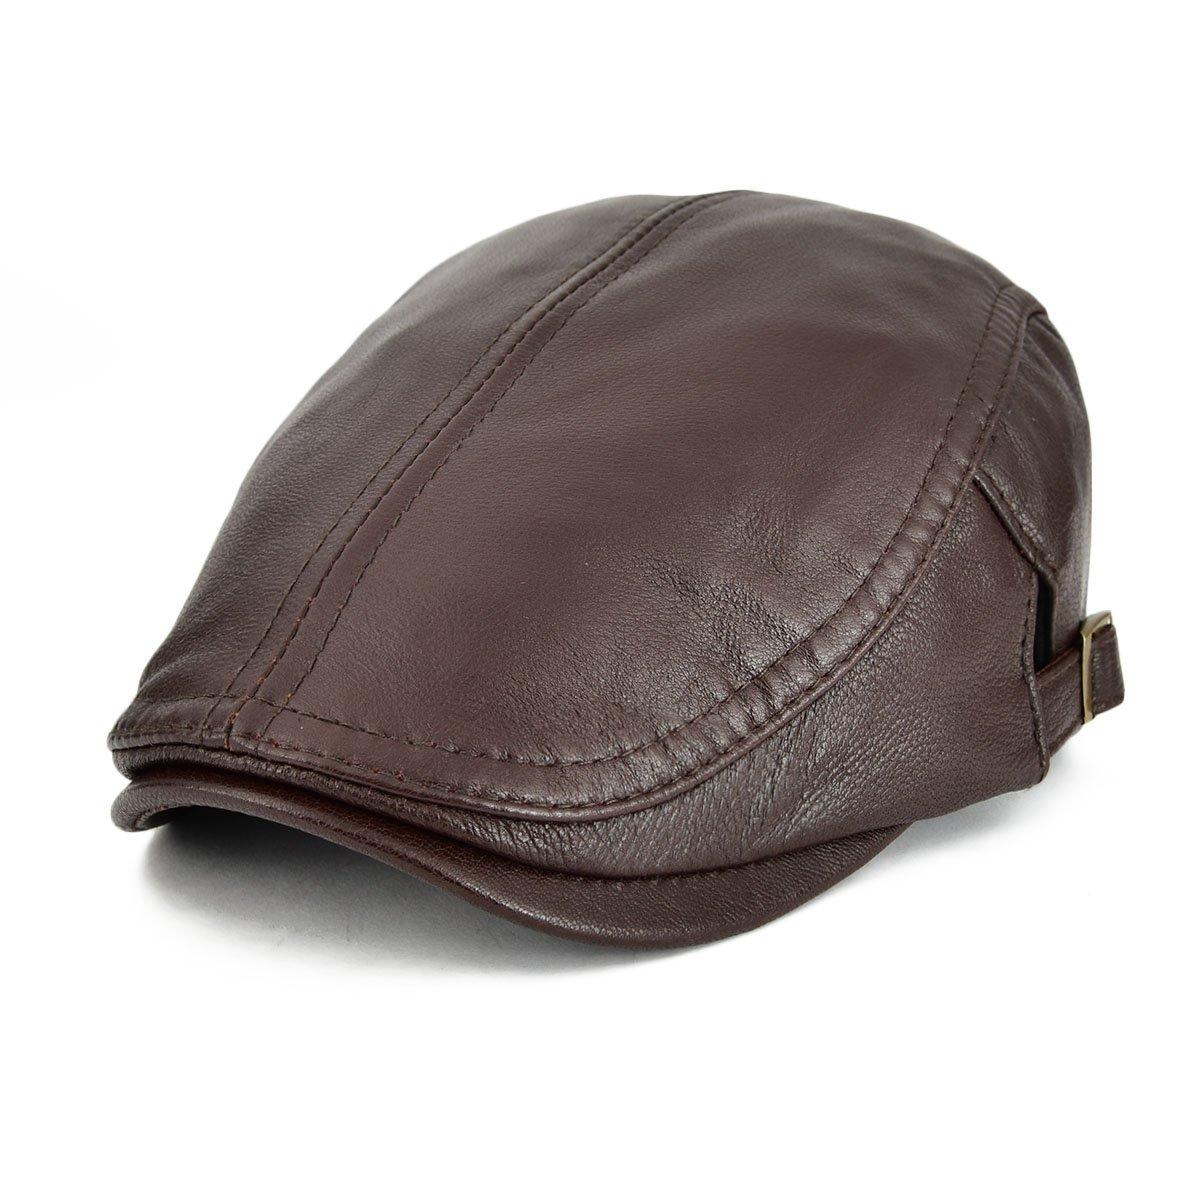 VOBOOM Men Women Adjustable Genuine Leather Ivy Cap Newsboy Hat 121 BDMZ121-Blk